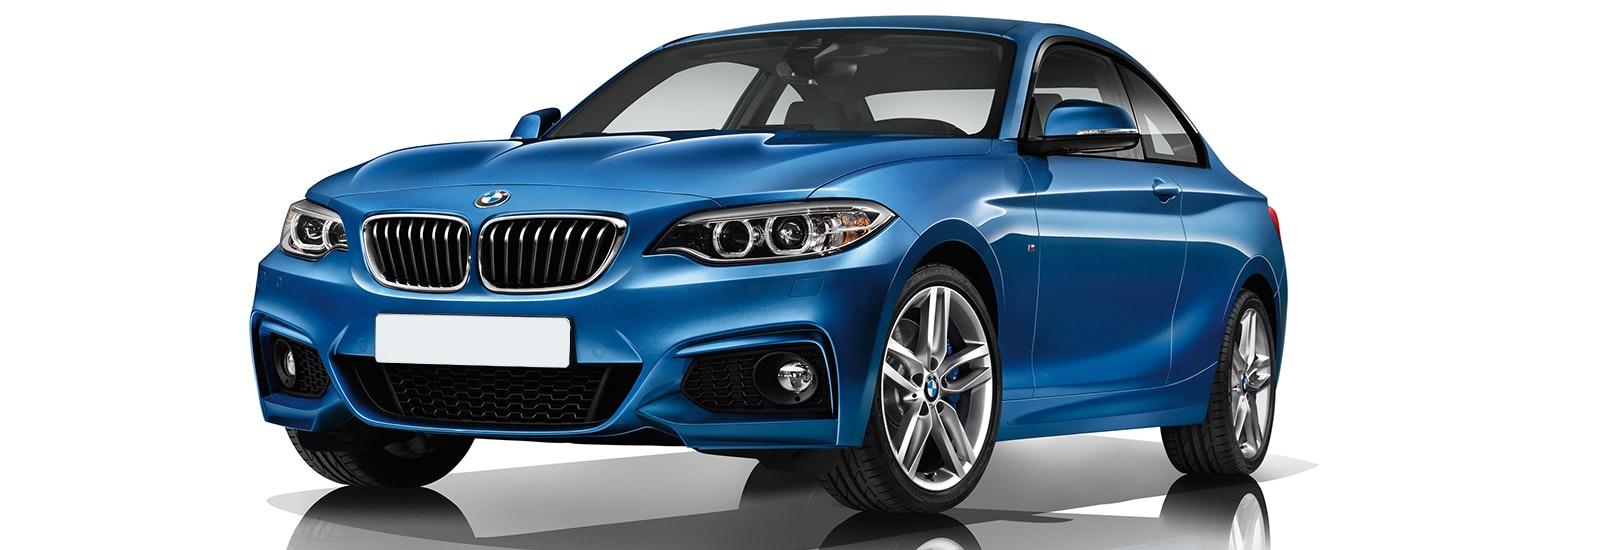 BMW 2 Series 218d U2013 65.7mpg